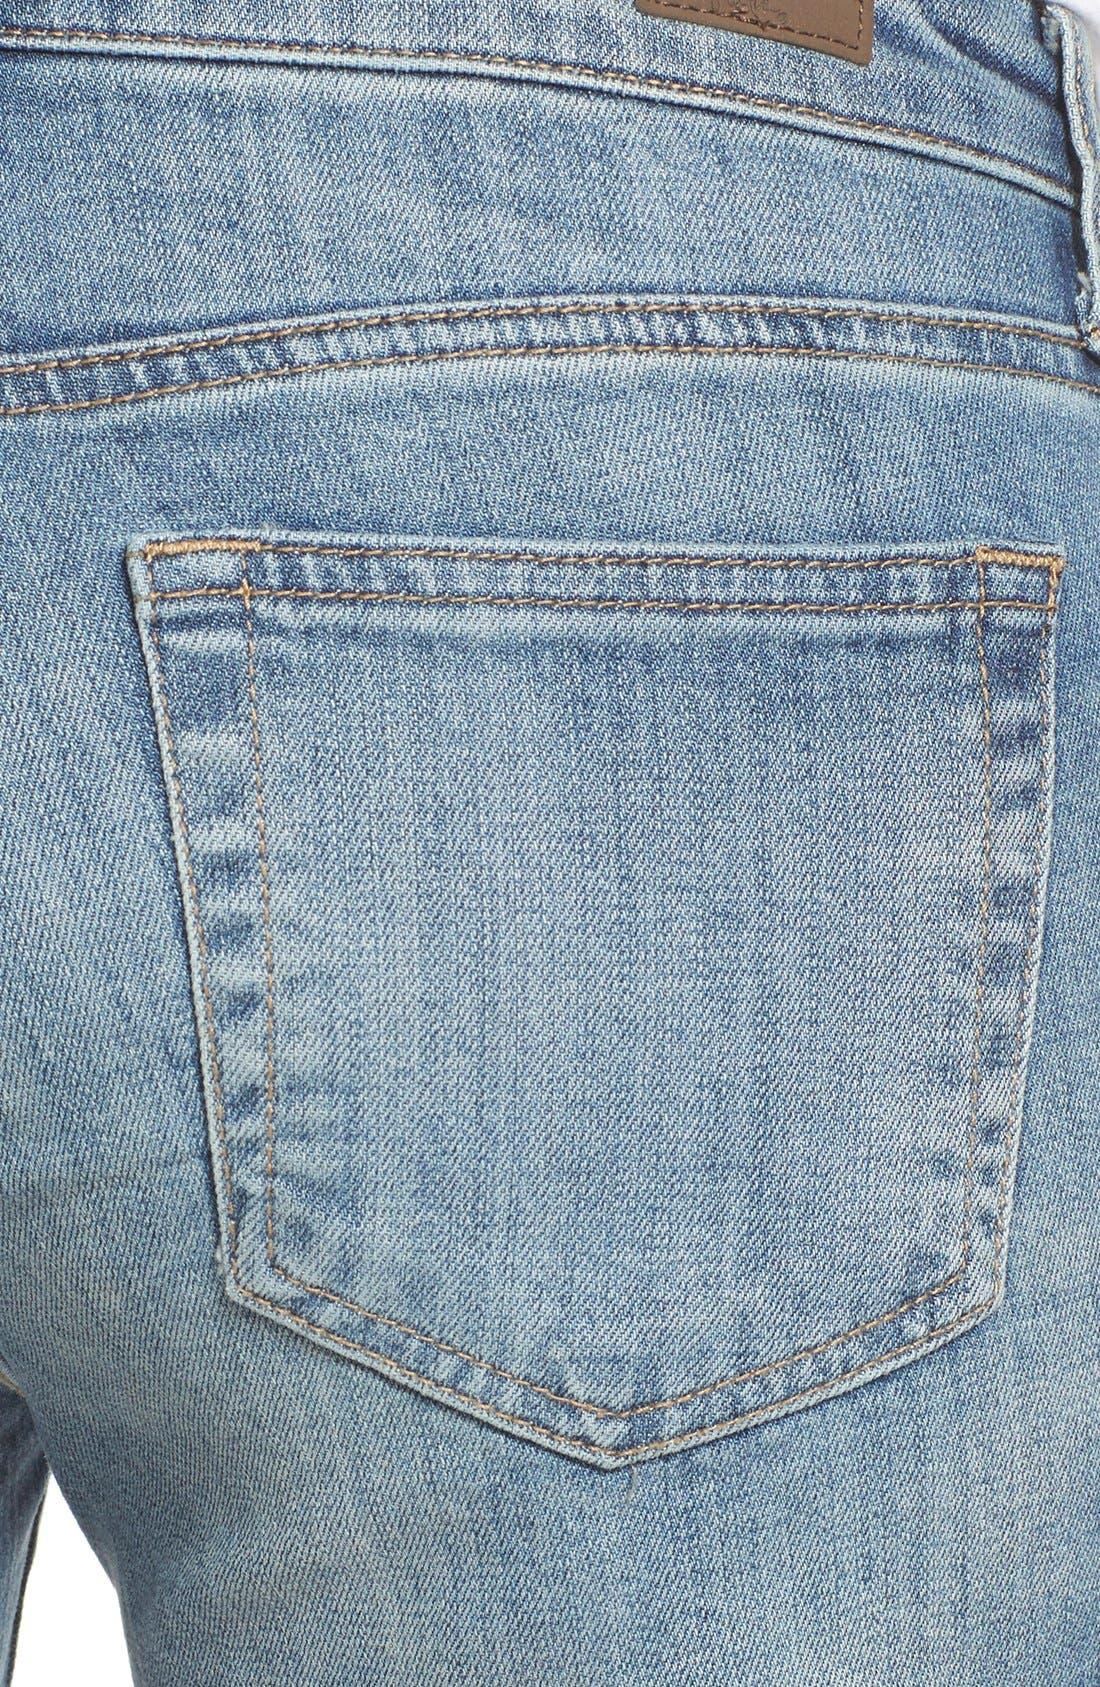 'Gidget' Denim Cutoff Shorts,                             Alternate thumbnail 7, color,                             420